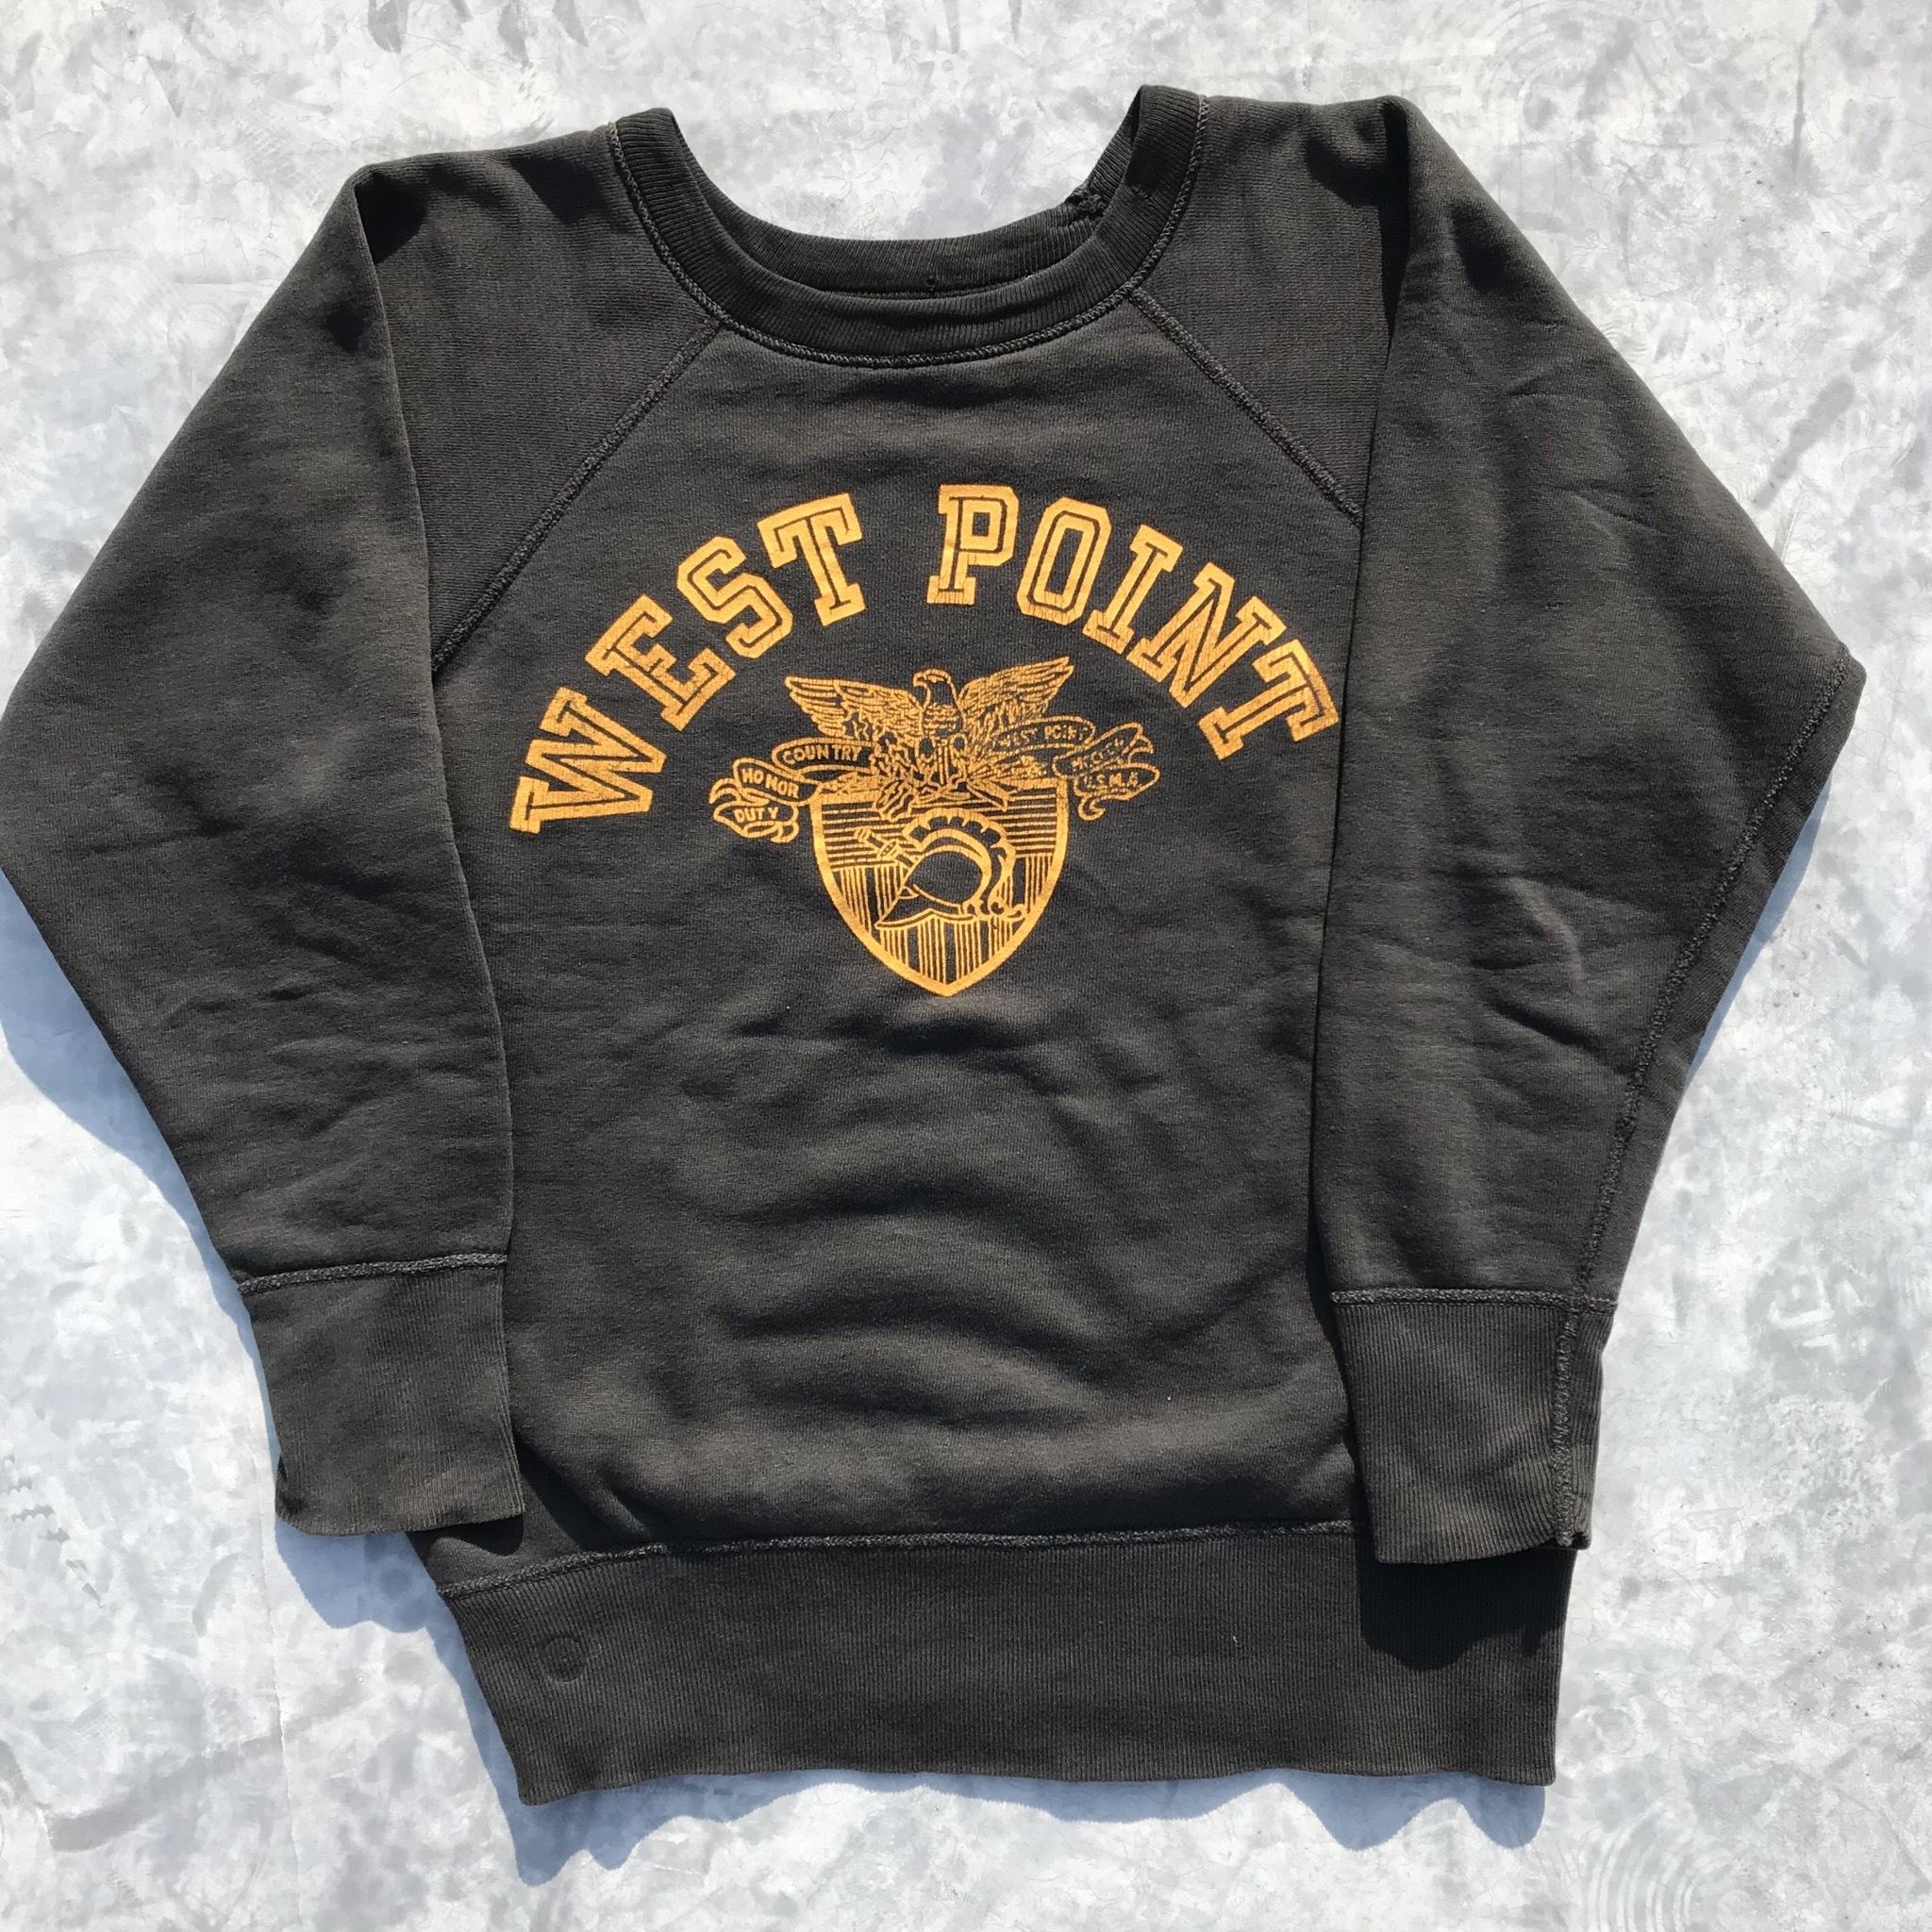 60's Champion チャンピオン カレッジ スウェット WEST POINT USMA 陸軍士官学校 ランタグ C中 Mサイズ